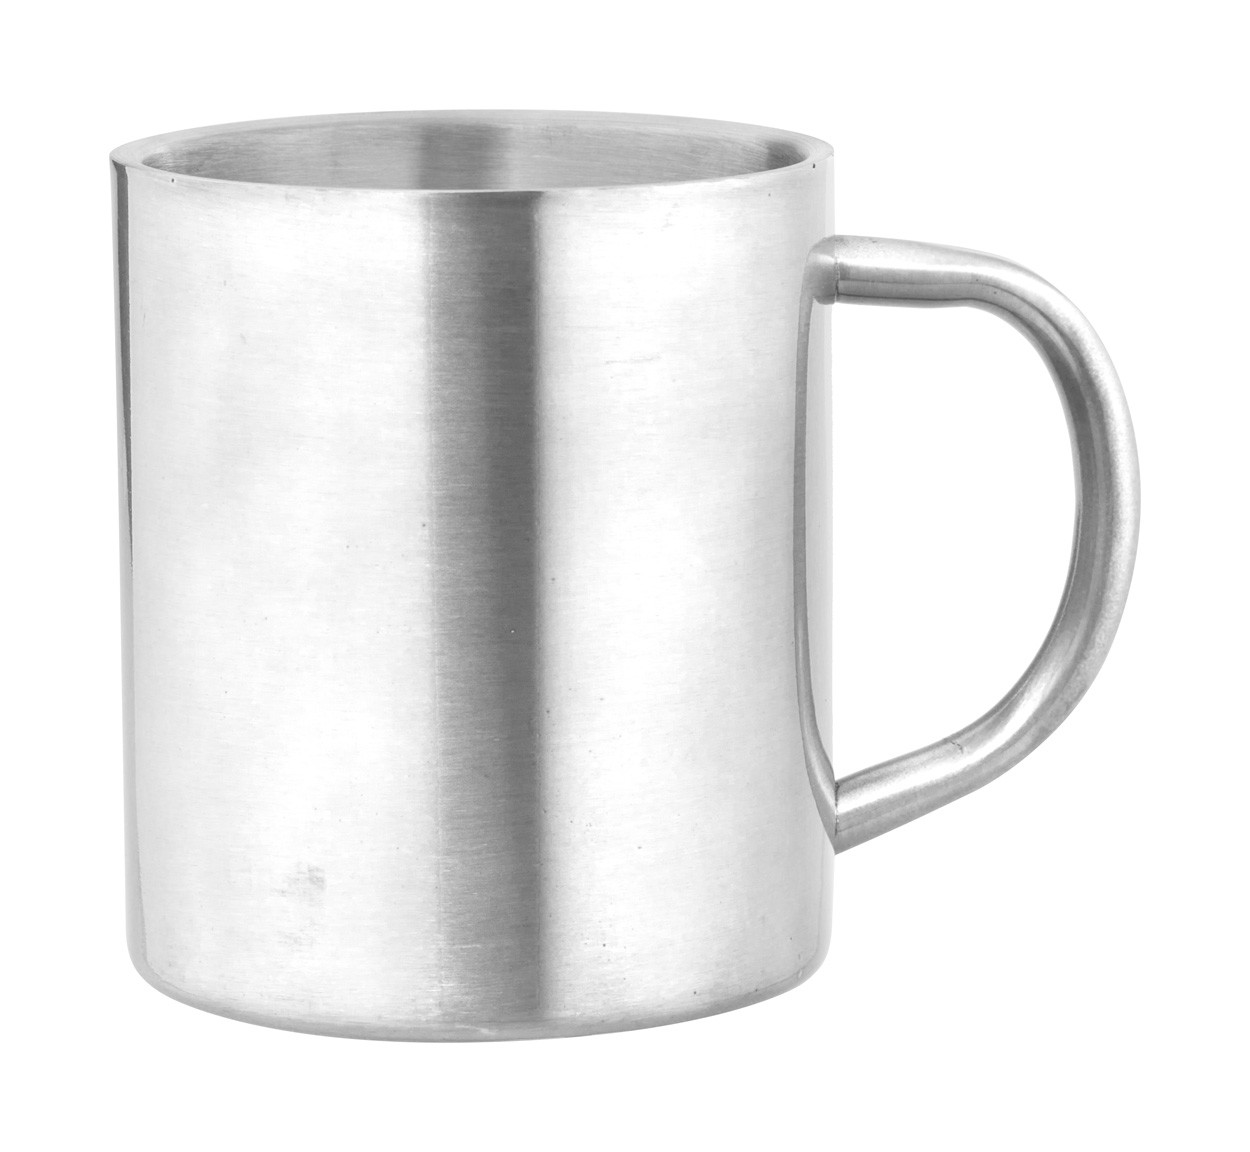 Mug Yozax - Silver